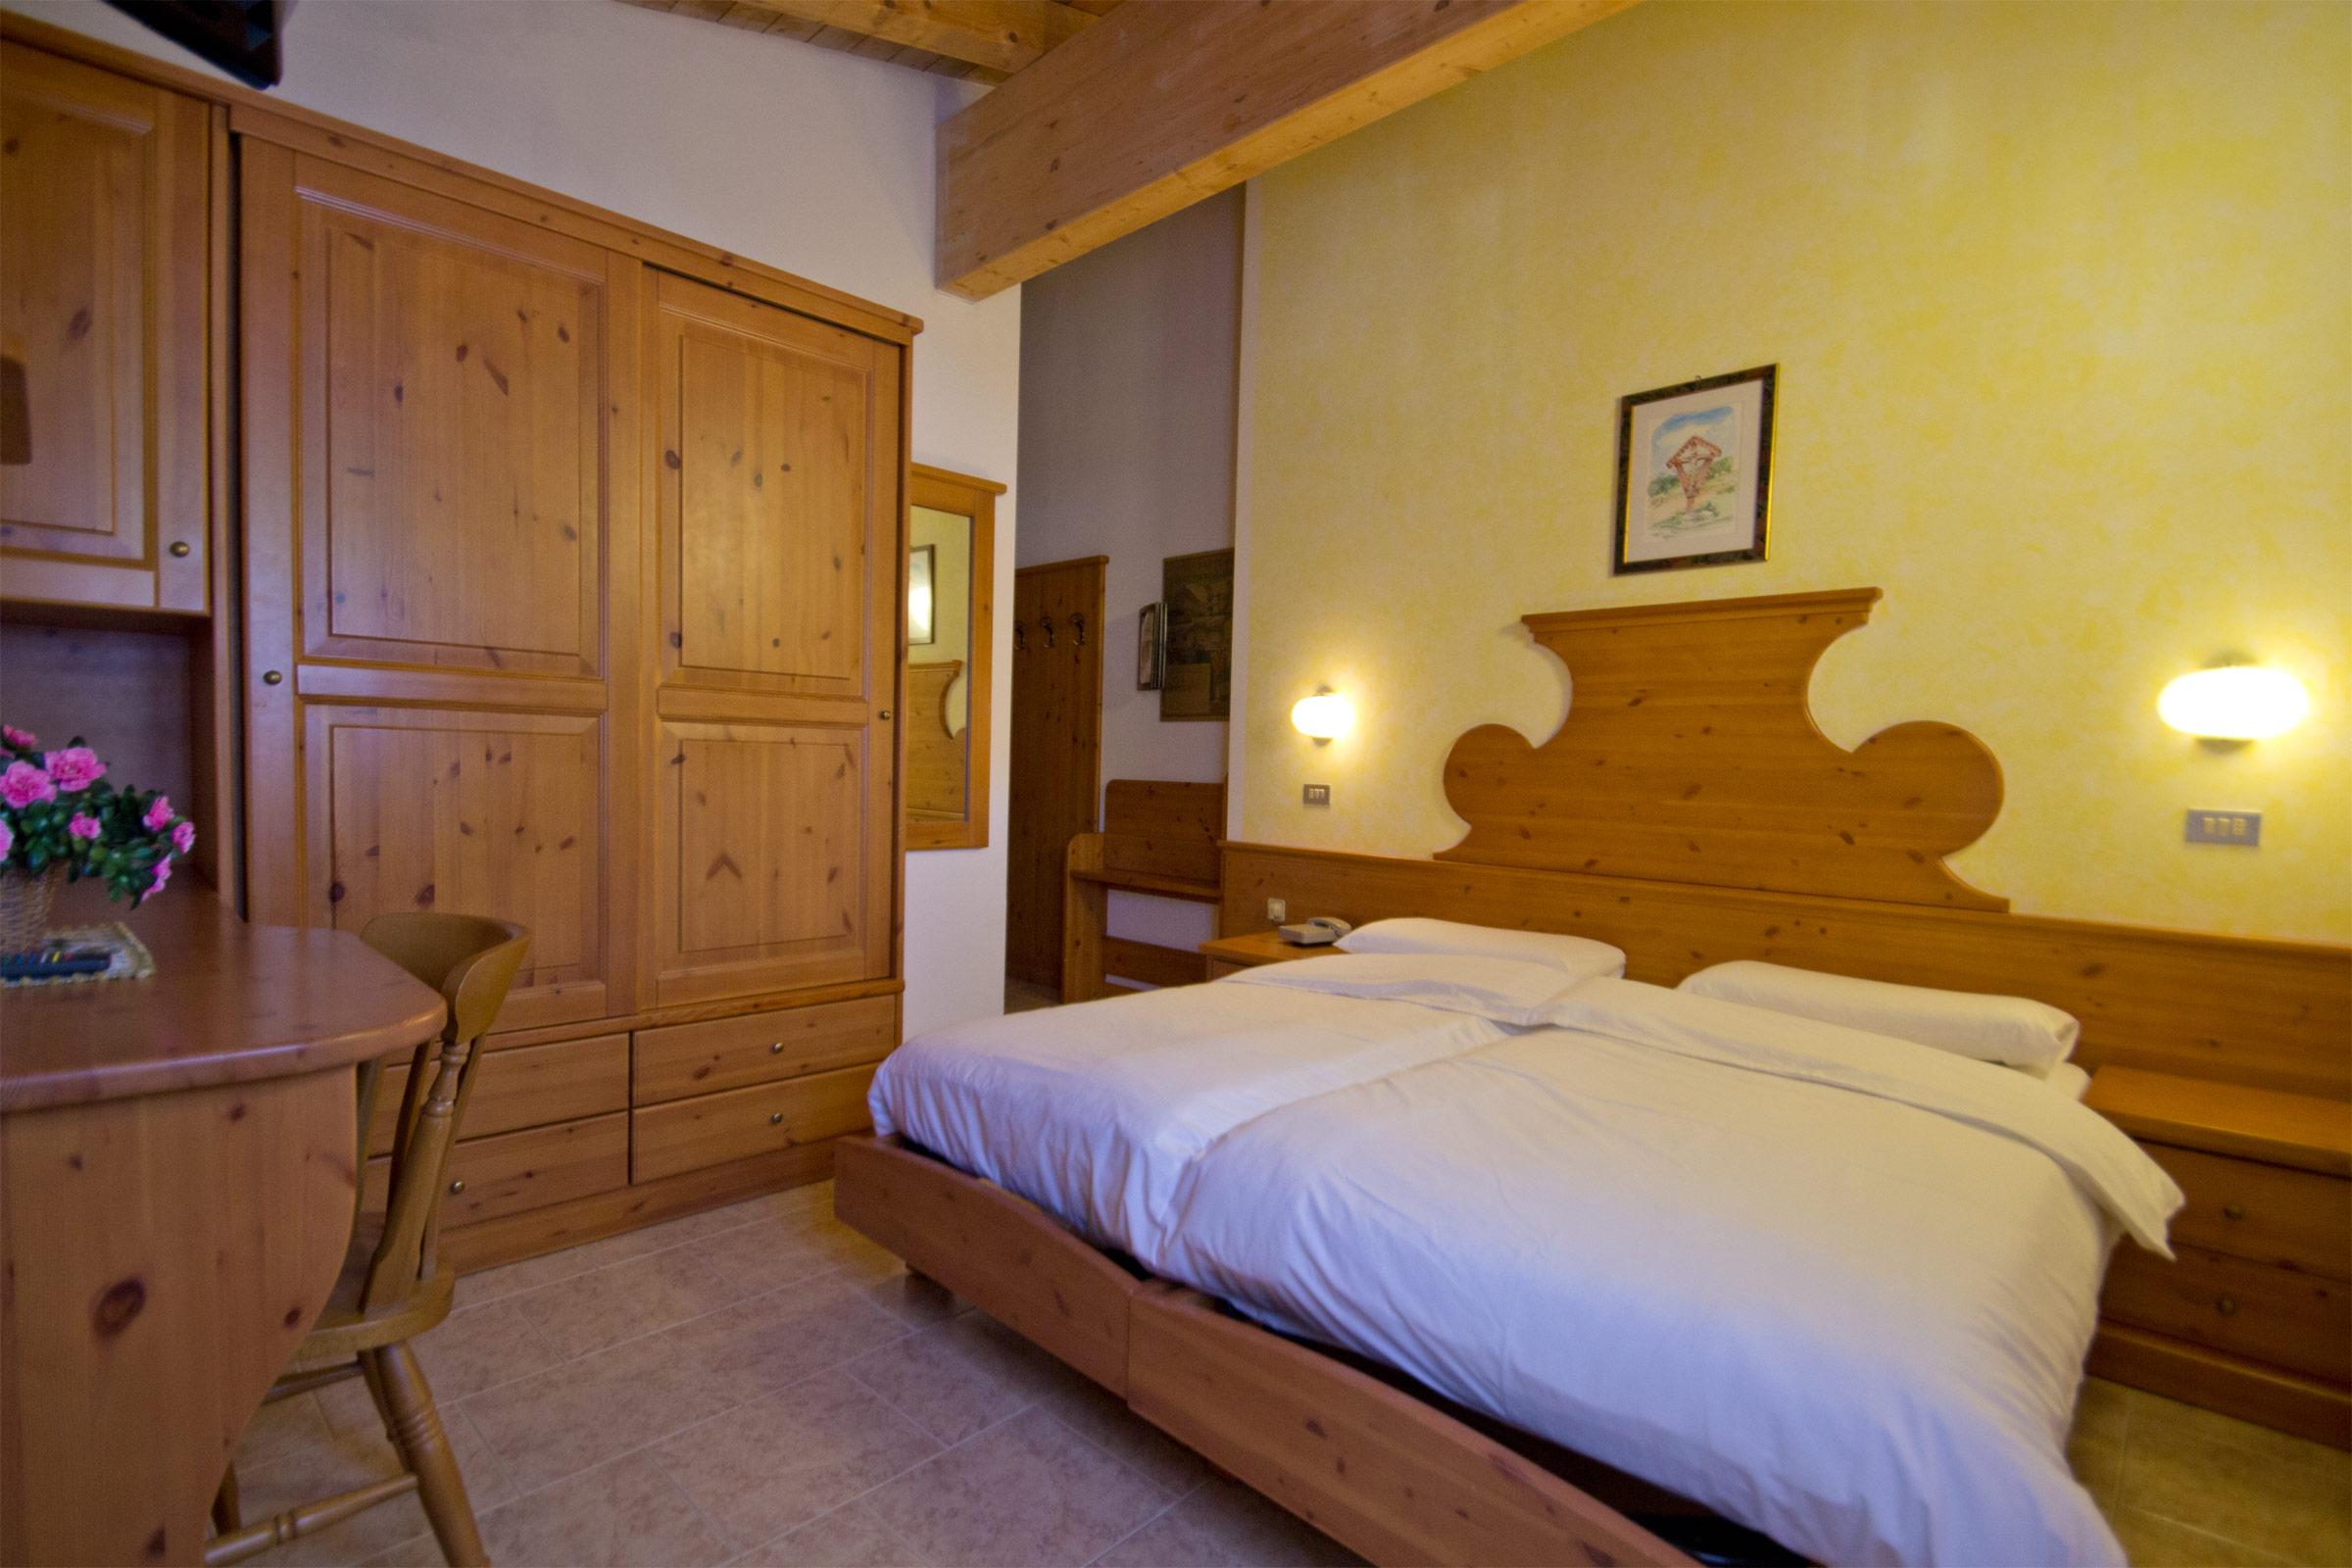 hotel-santa-maria-rooms-8